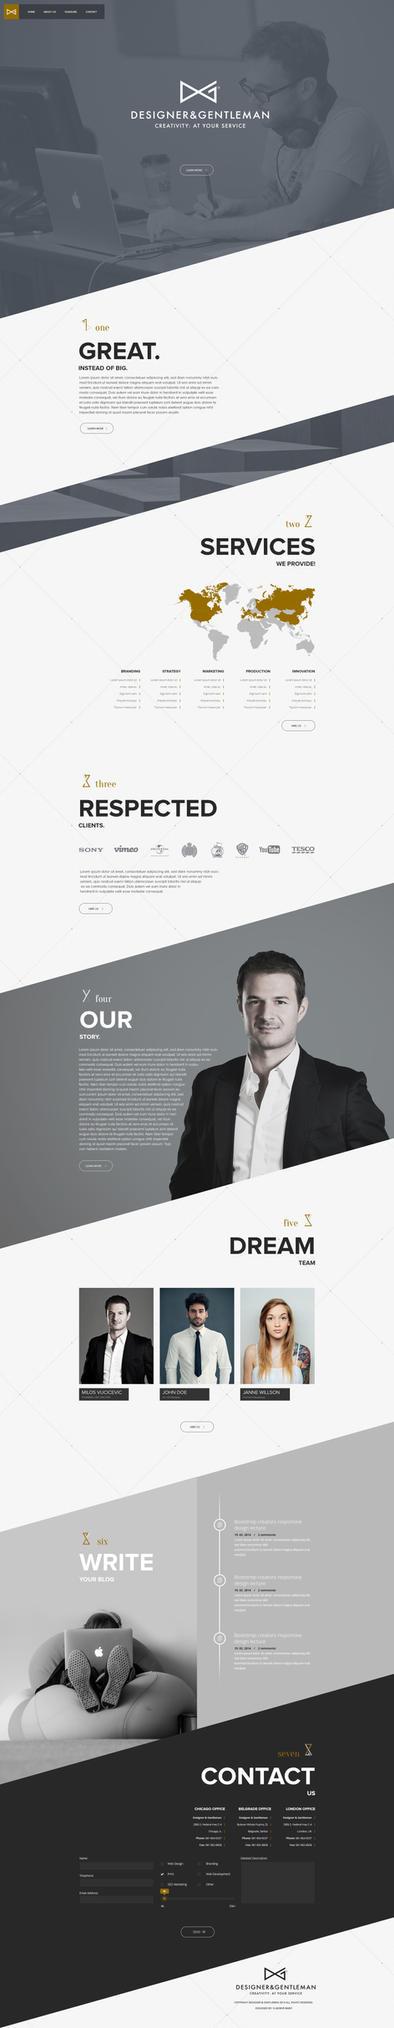 Designer and Gentleman by vBabic